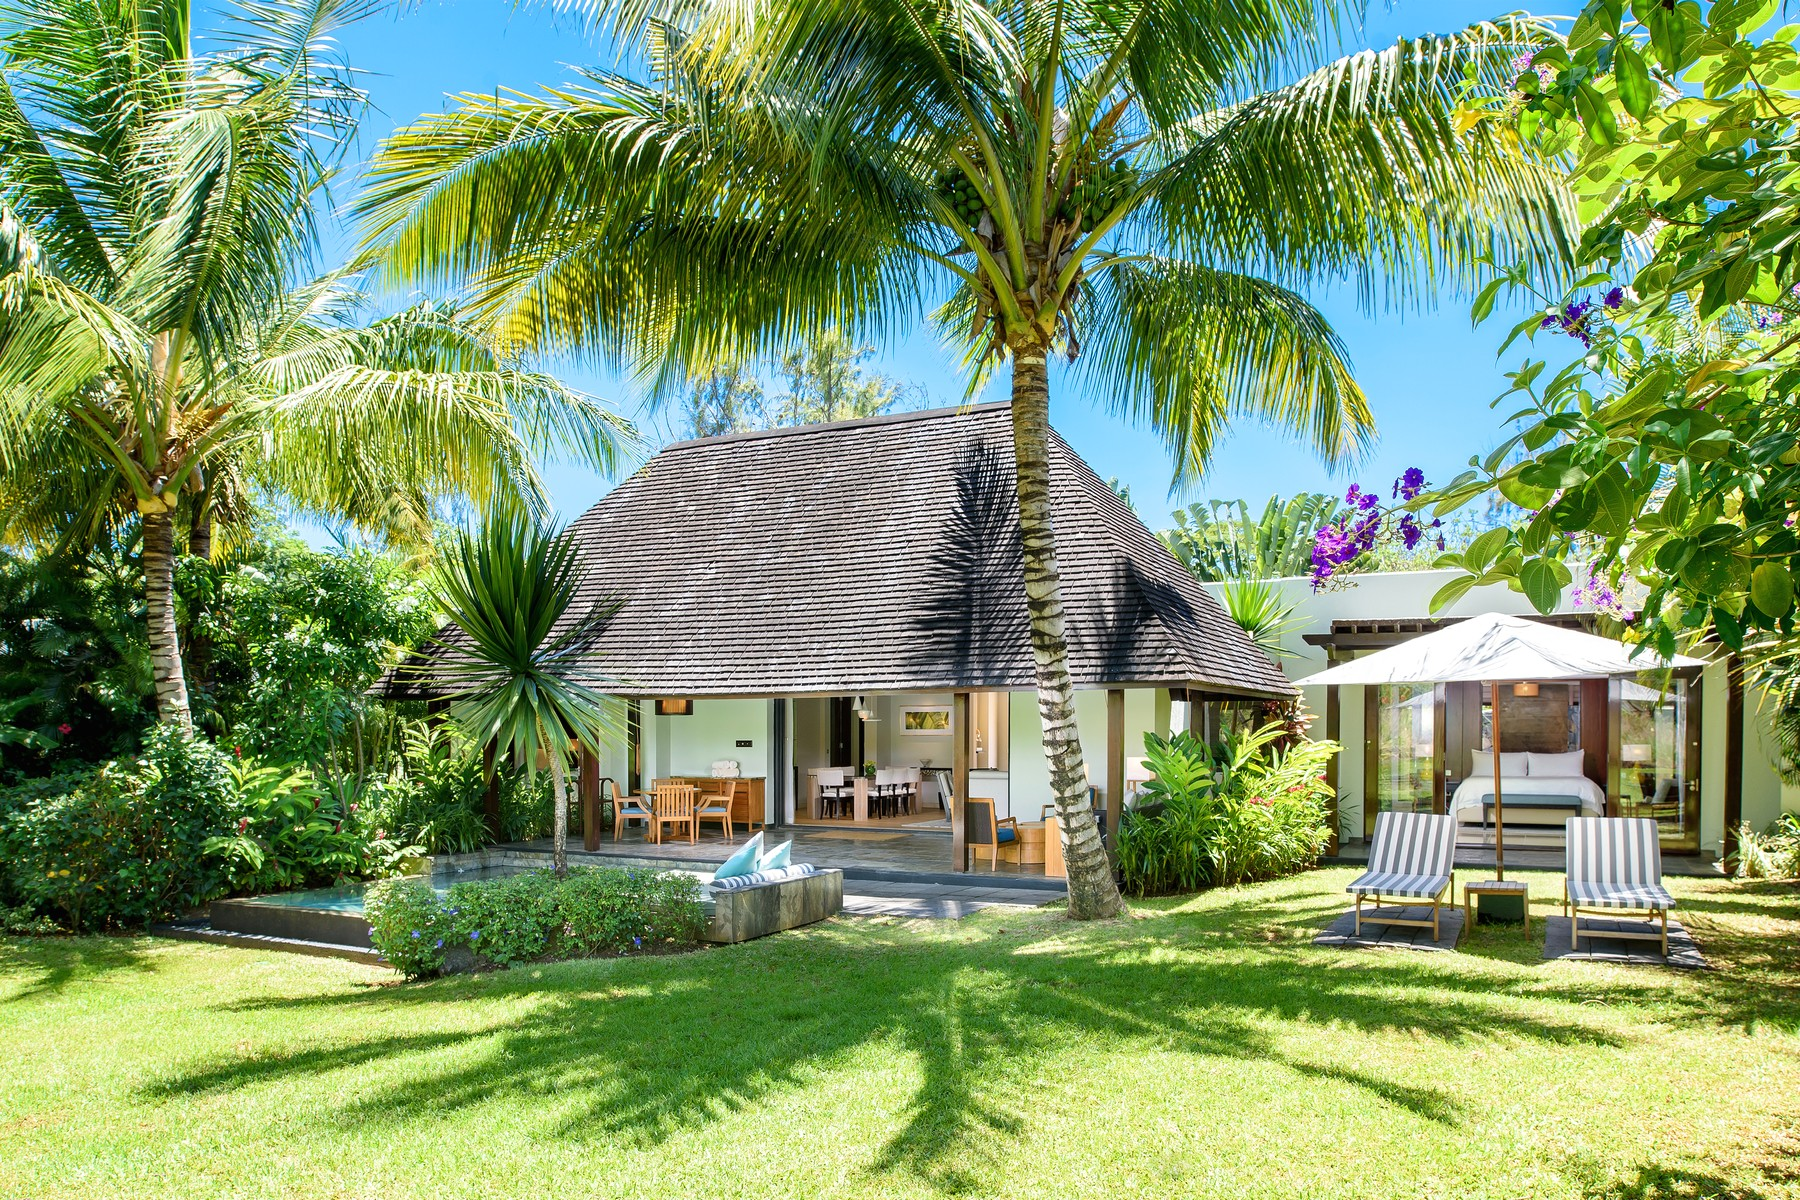 Single Family Home for Sale at Villa 215, Four Seasons Private Residence, Anahita Beau Champ, Flacq Mauritius